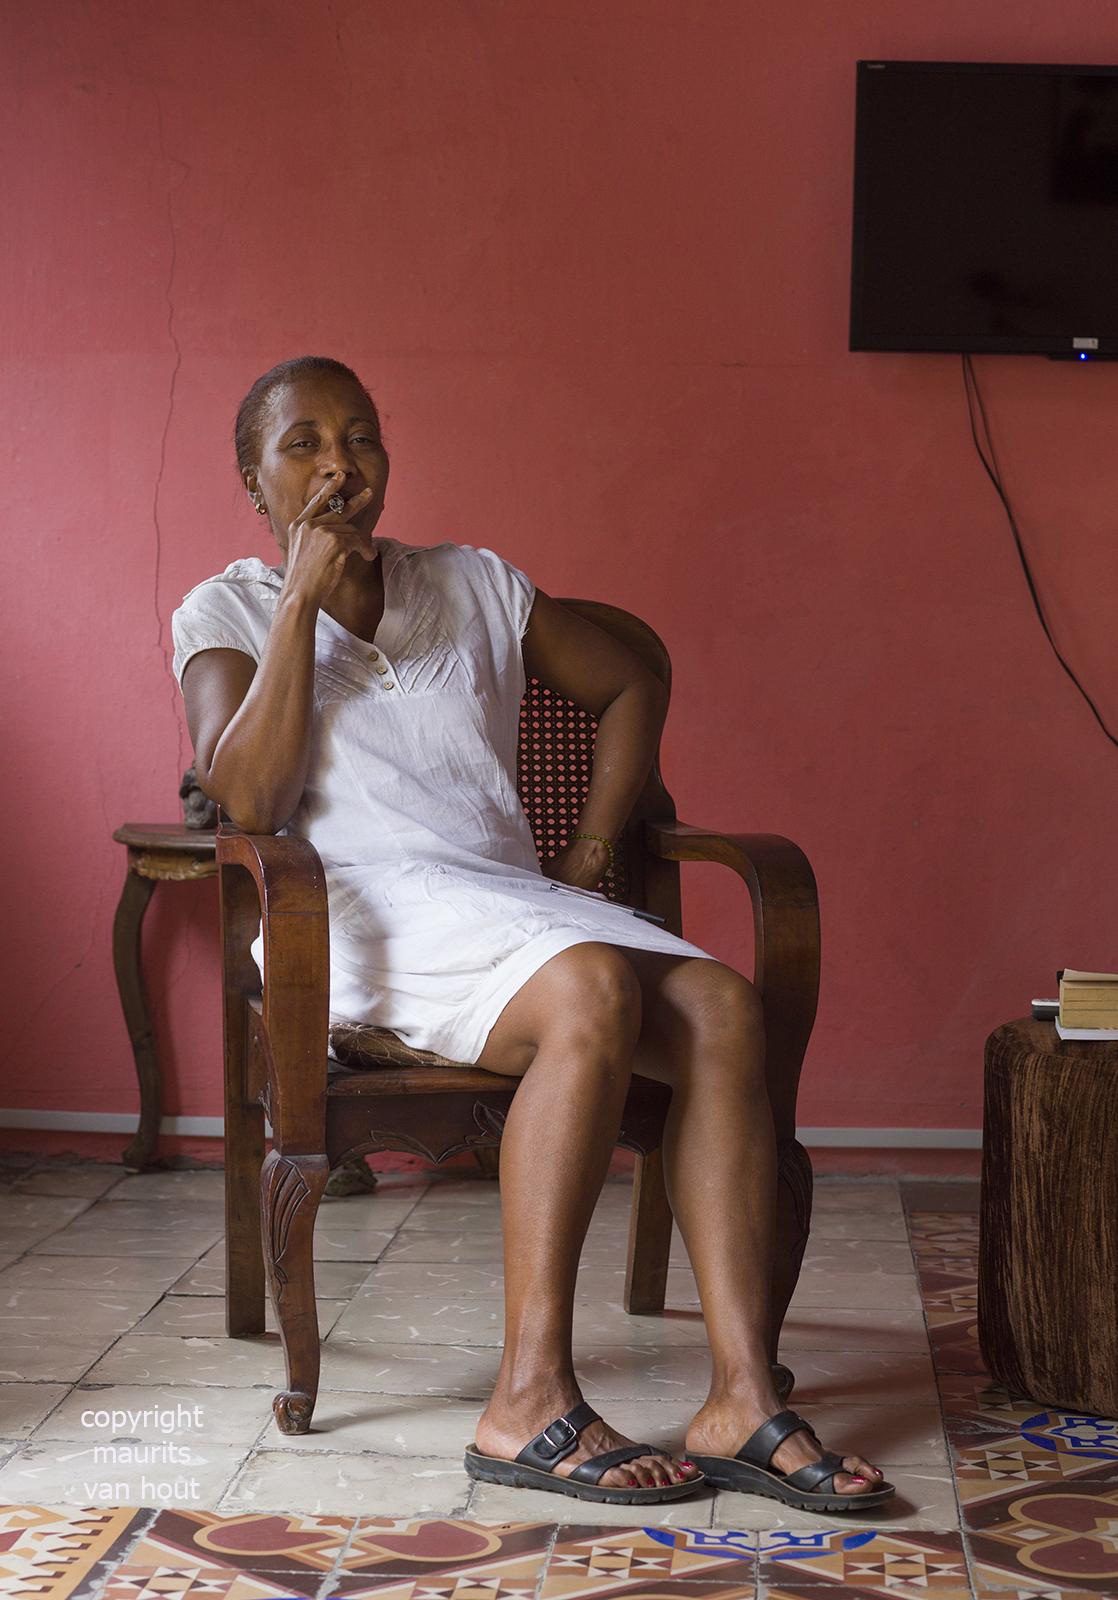 portrait of a woman, Havana Cuba, by Dutch photographer Maurits van Hout